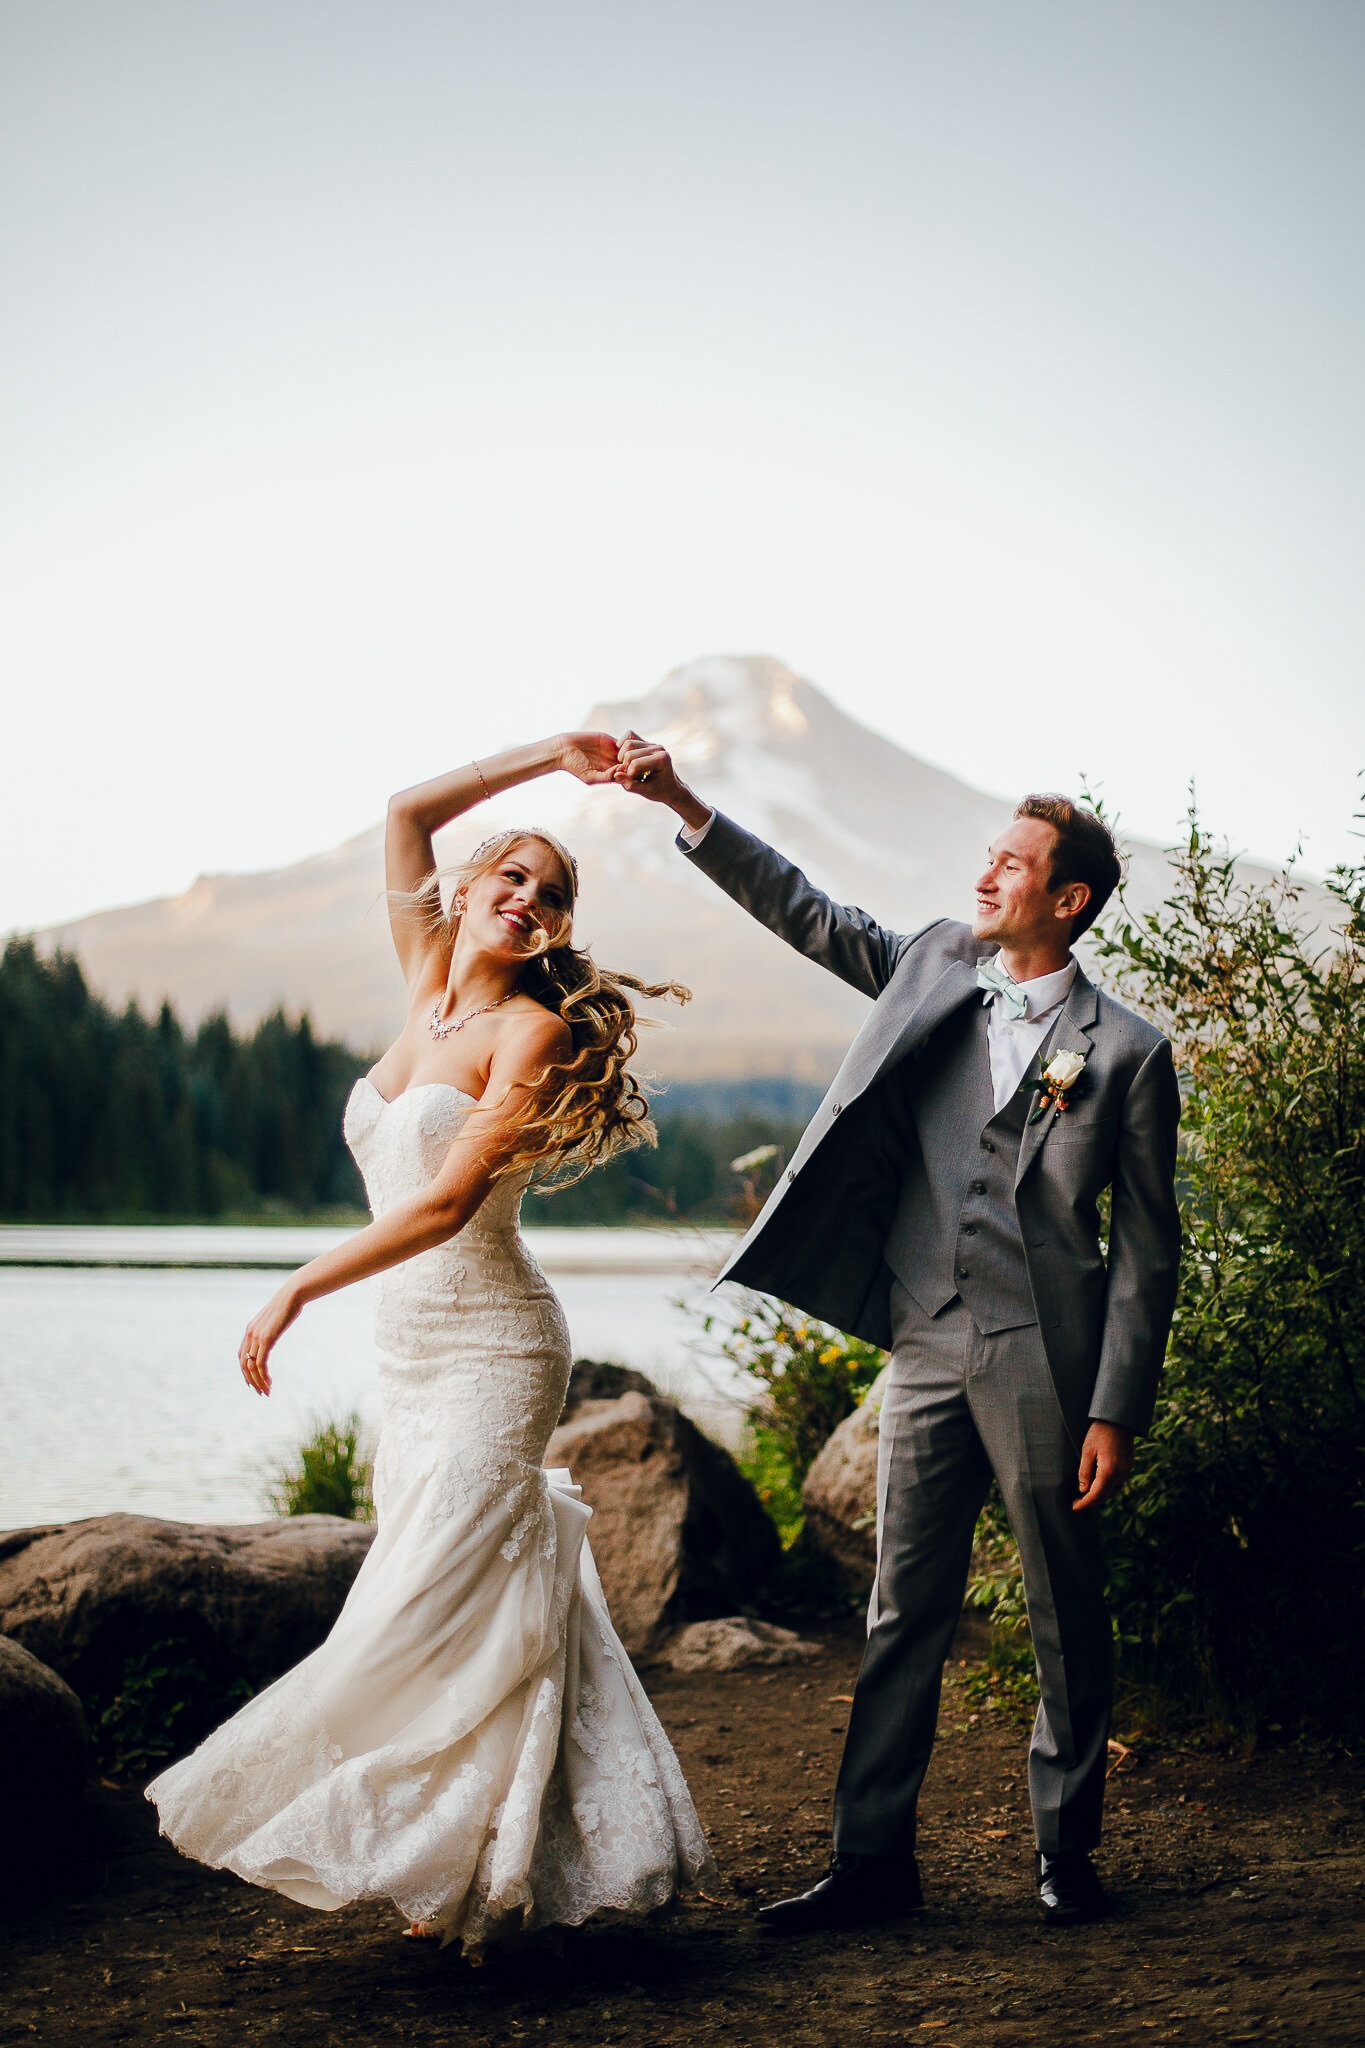 Archer+Inspired+Photography+Northern+California+Portland+Oregon+Mt+Hood+Wedding+Lifestyle+Destination+Traveling+Photographer-504.jpg